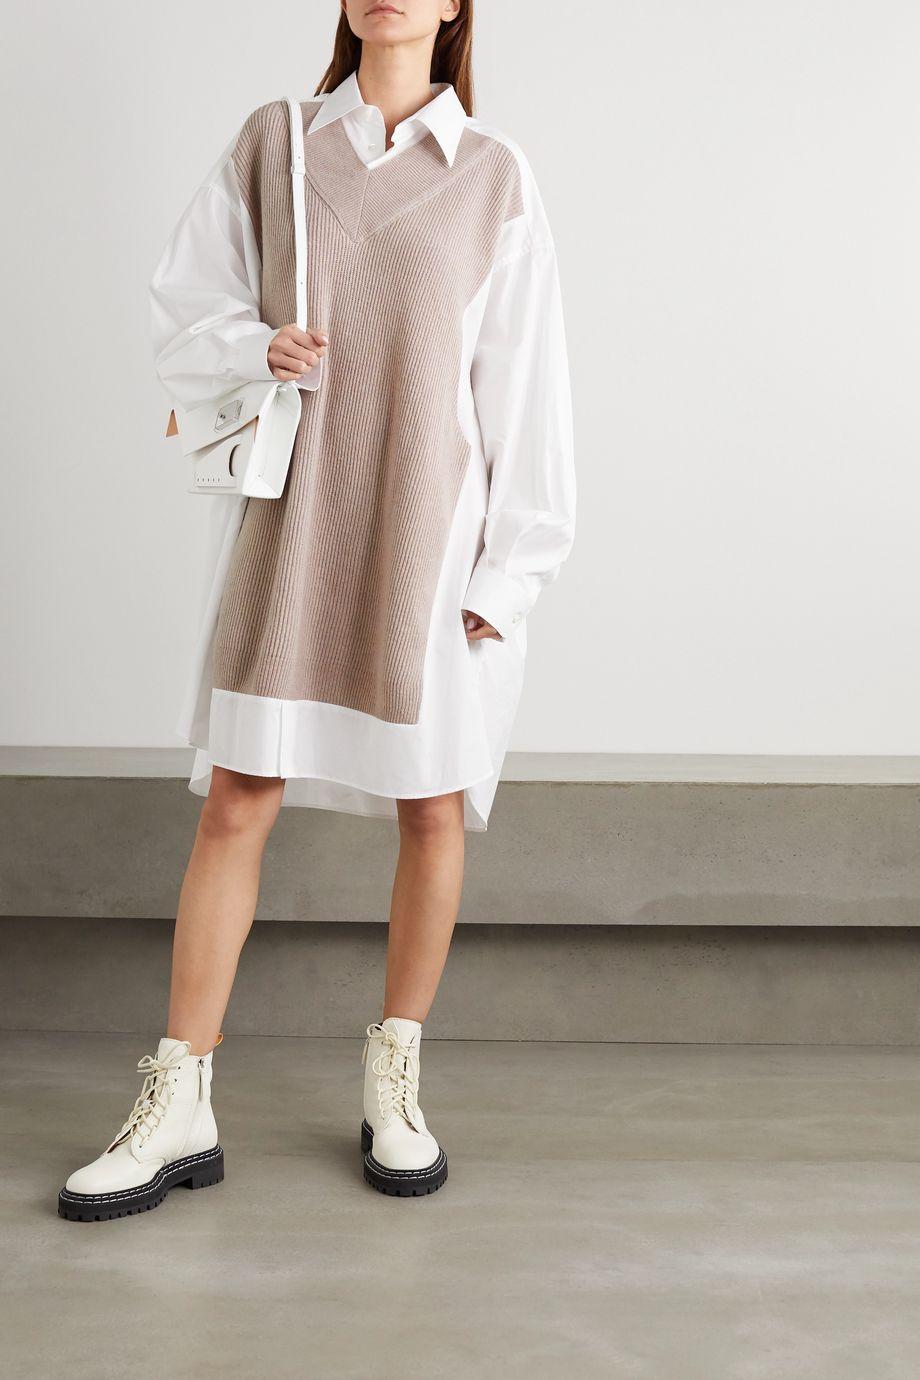 Maison Margiela Ribbed wool and cotton-poplin shirt dress